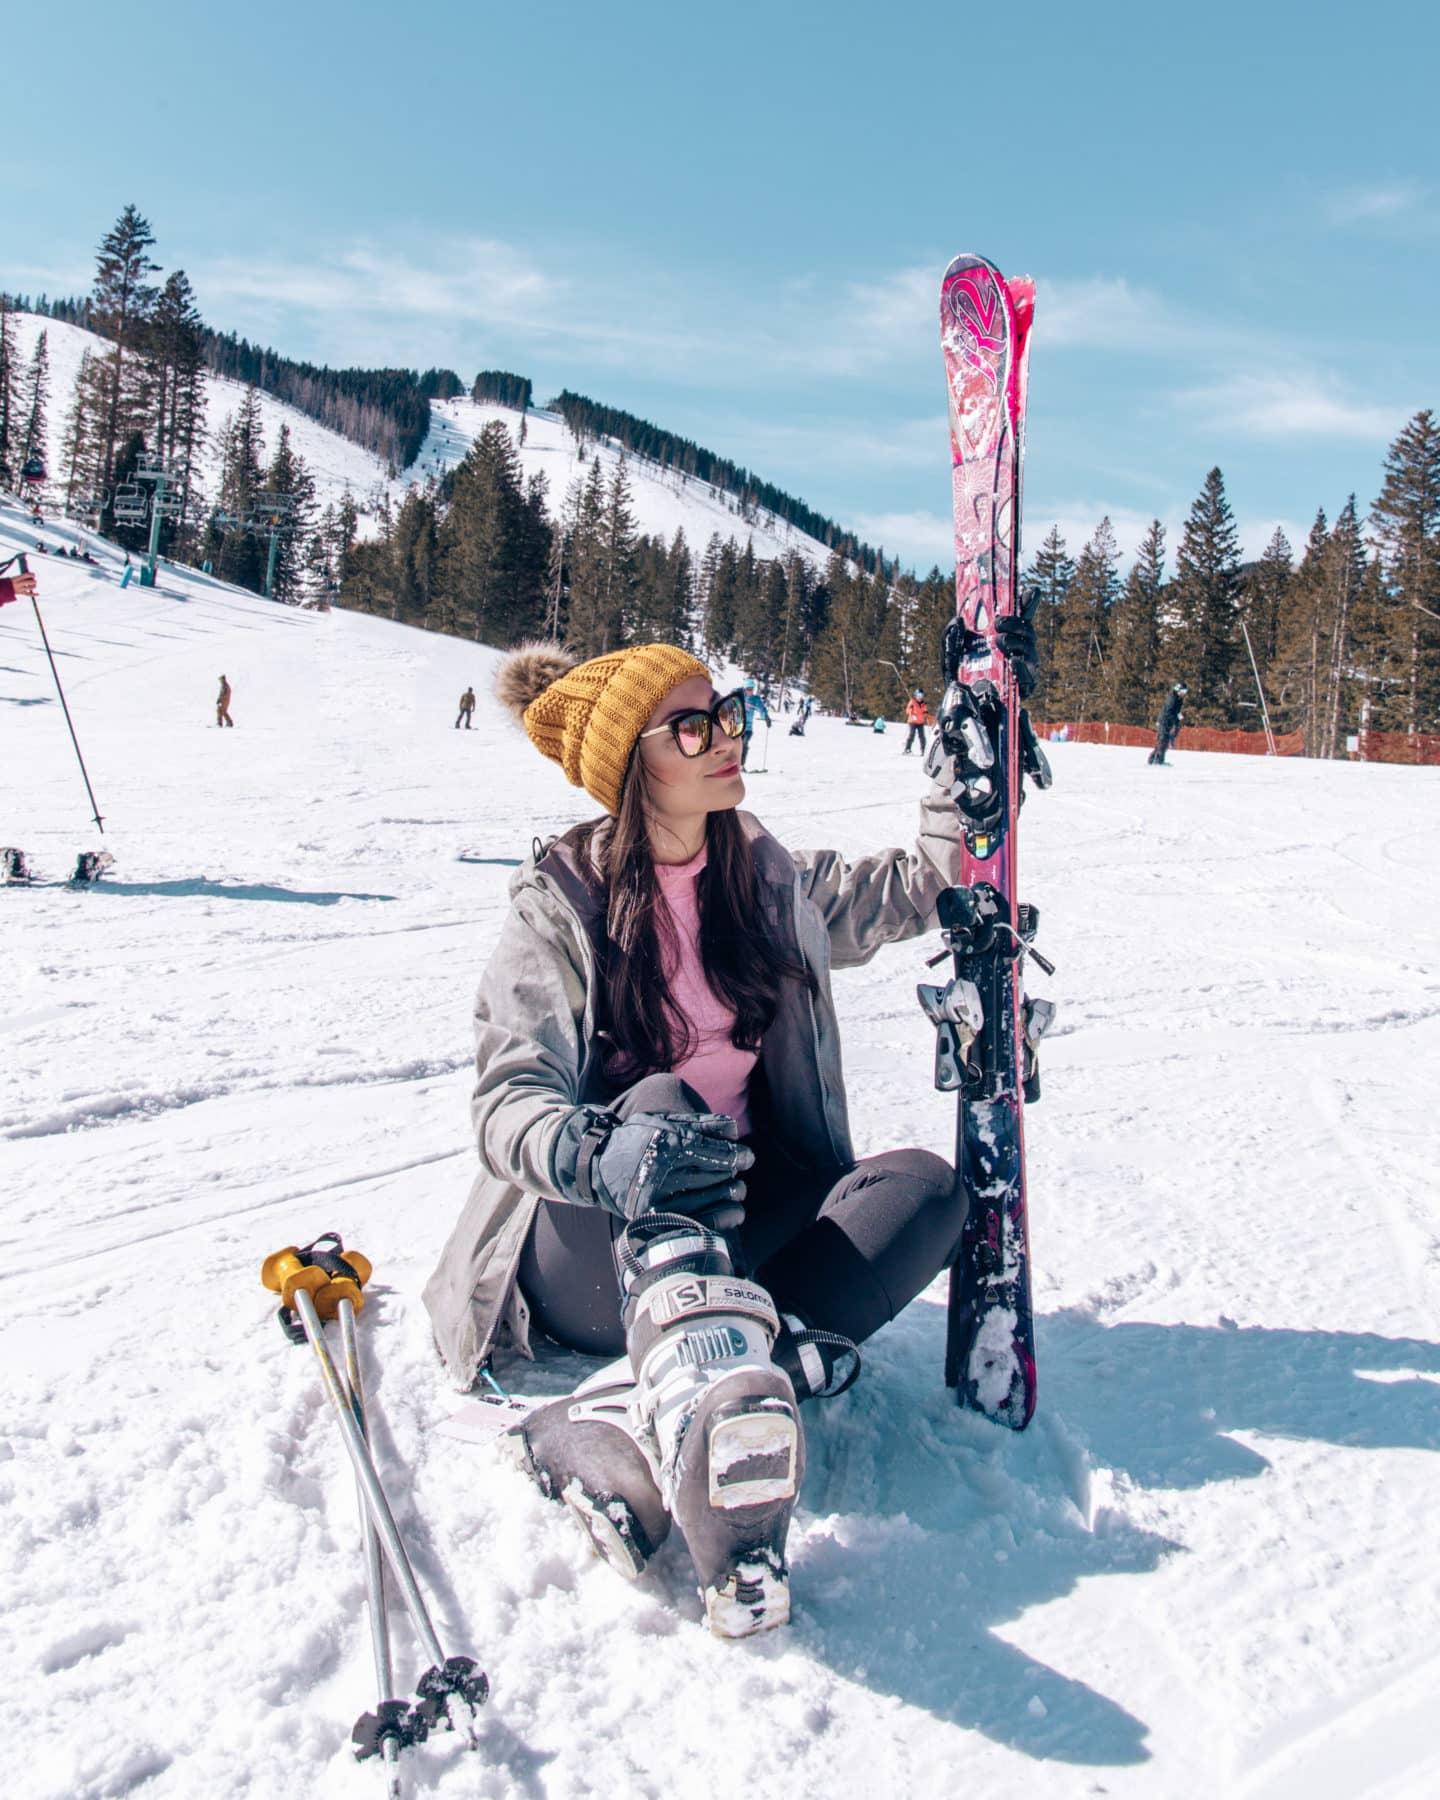 girl sitting on snow holding skis